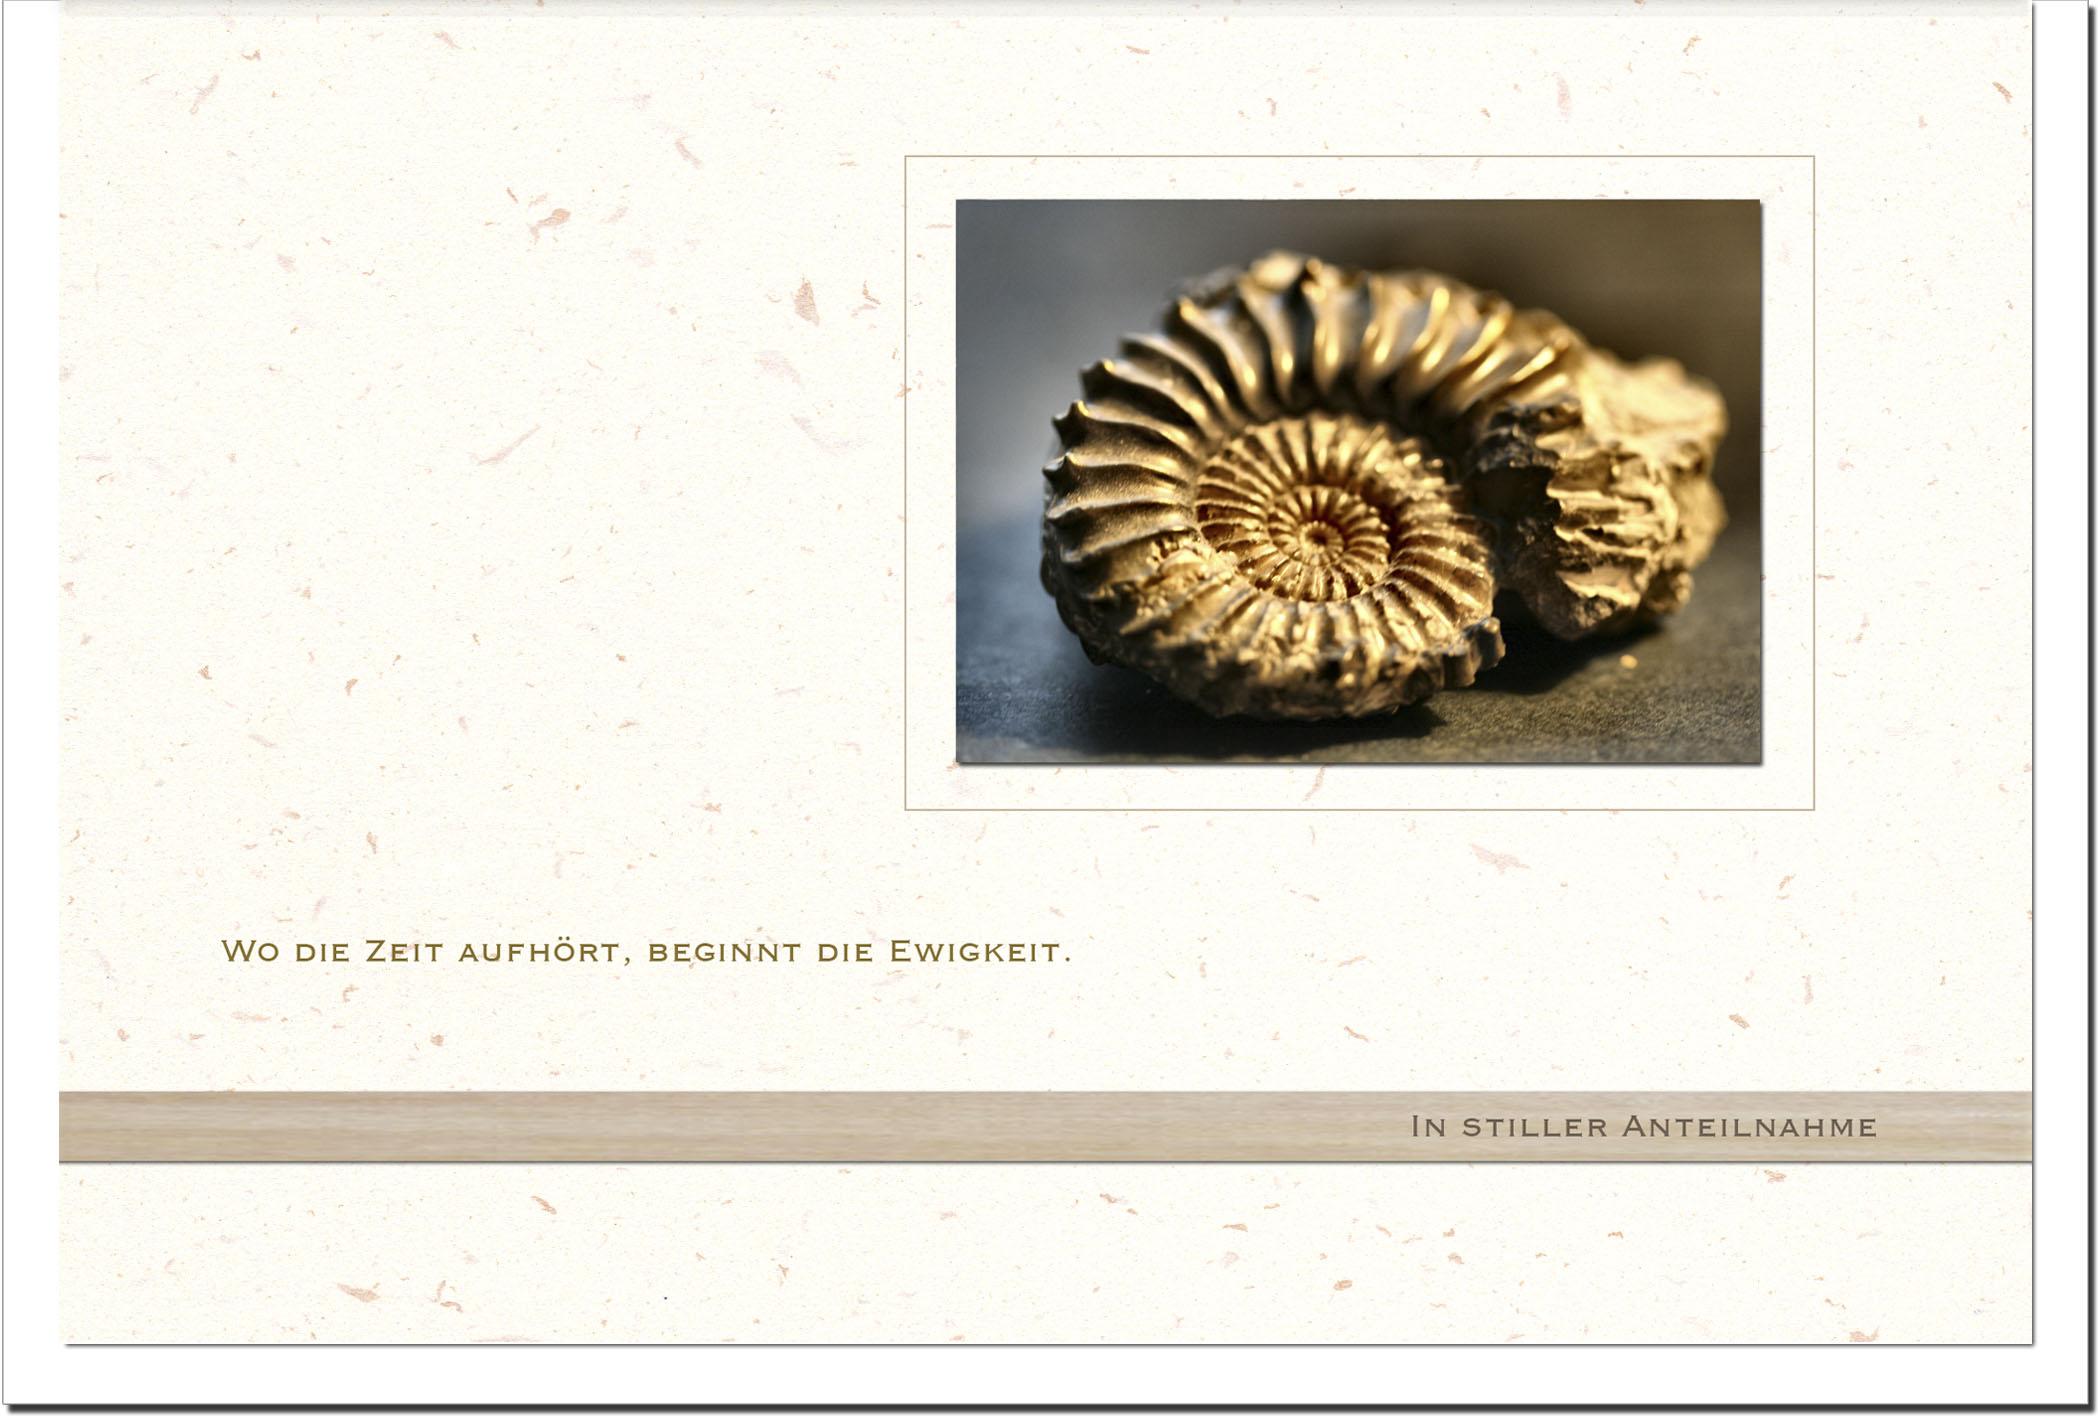 Beileidskarte BEGINN DER EWIGKEIT | Fossil | metALUm #00560